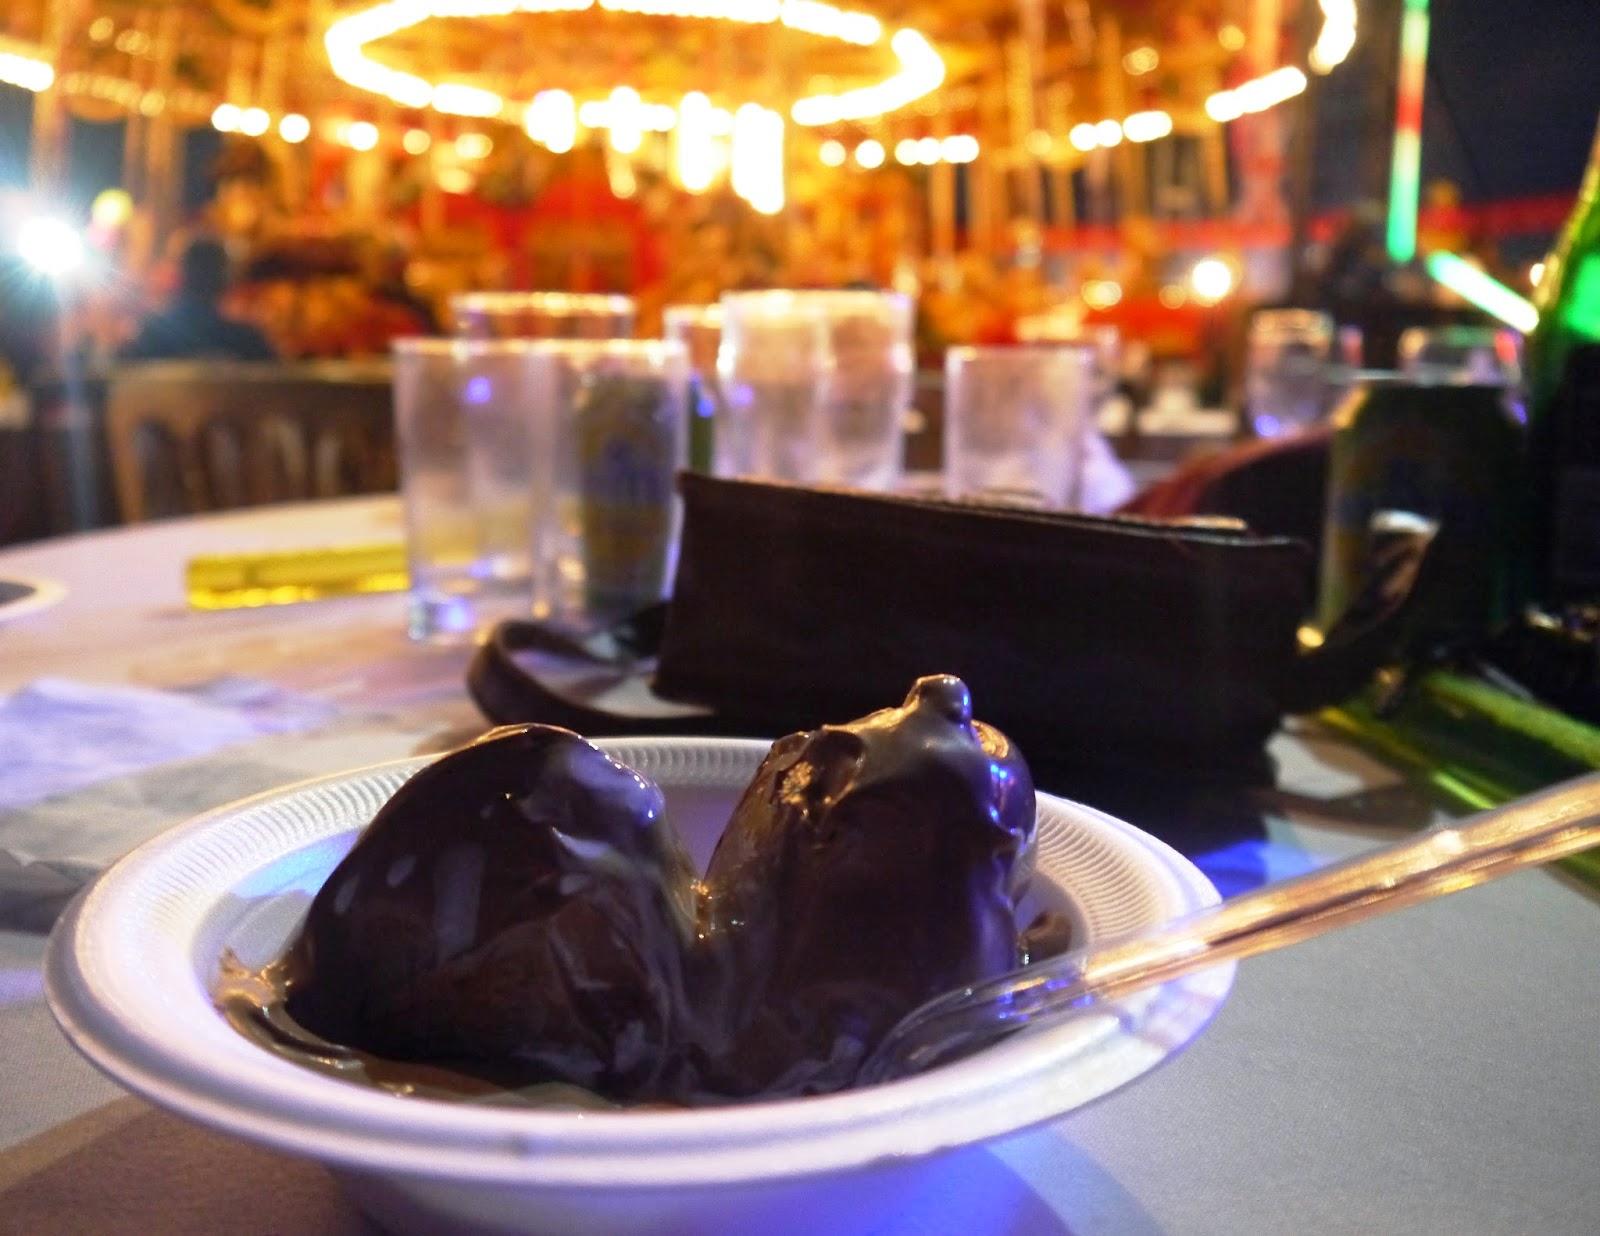 Carters Steam Fair Wedding - Profiteroles for pudding